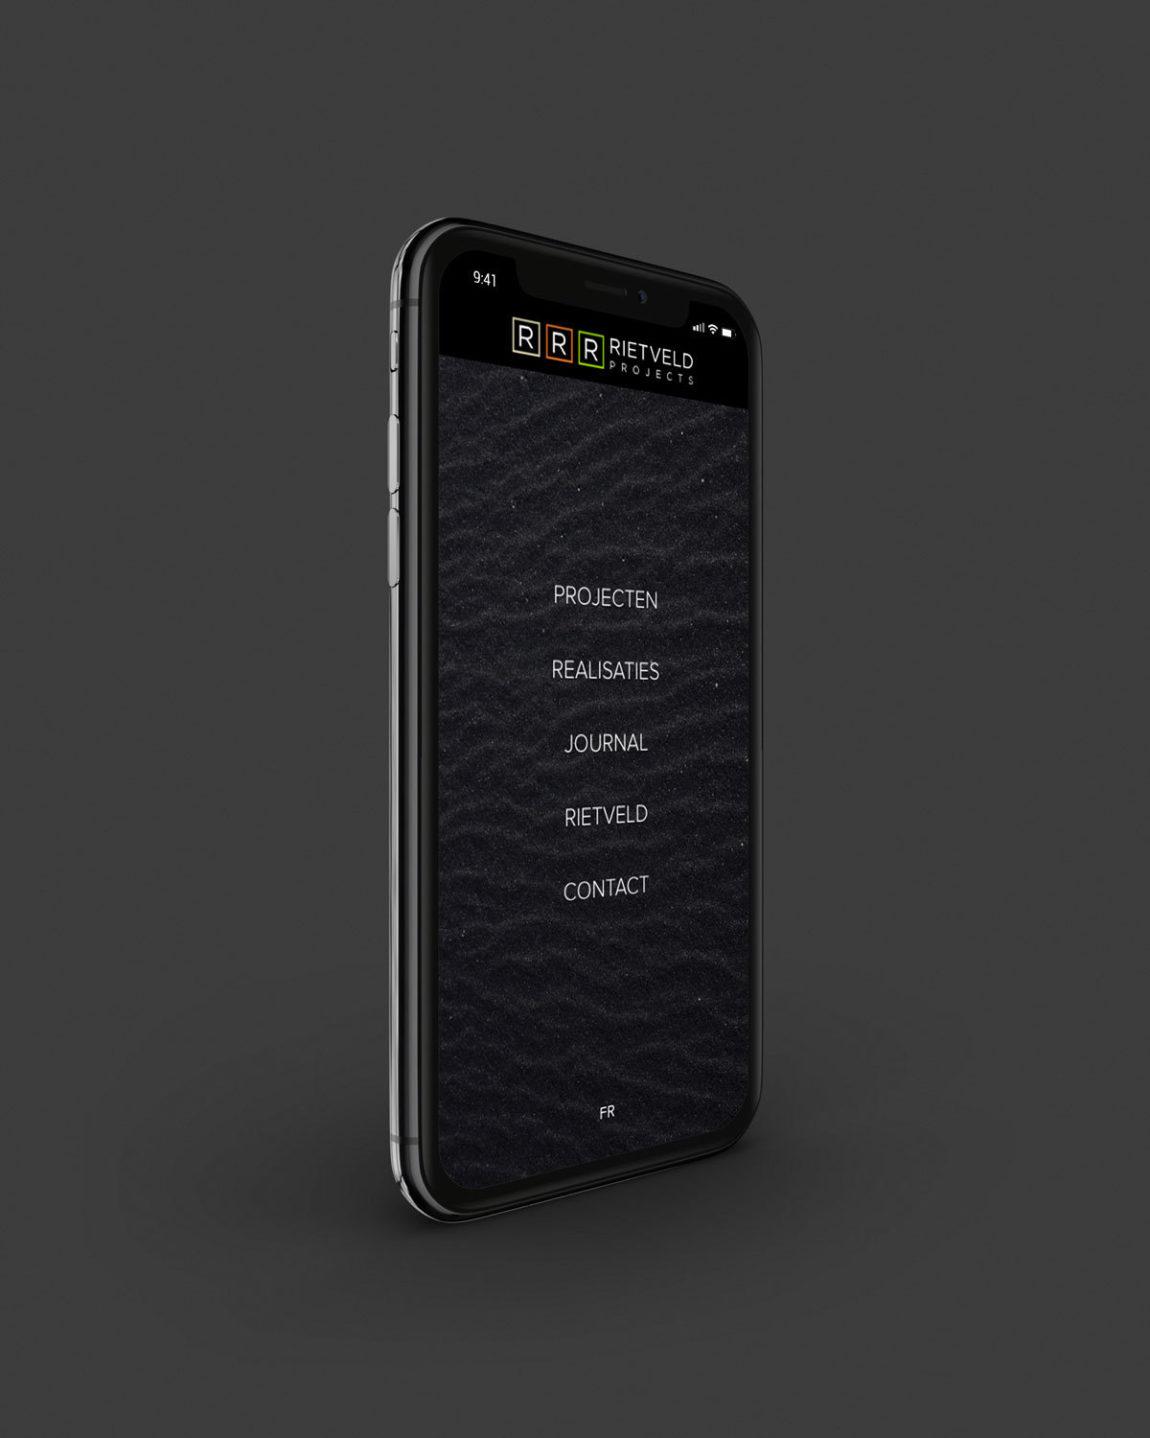 Iphone rietveld v1